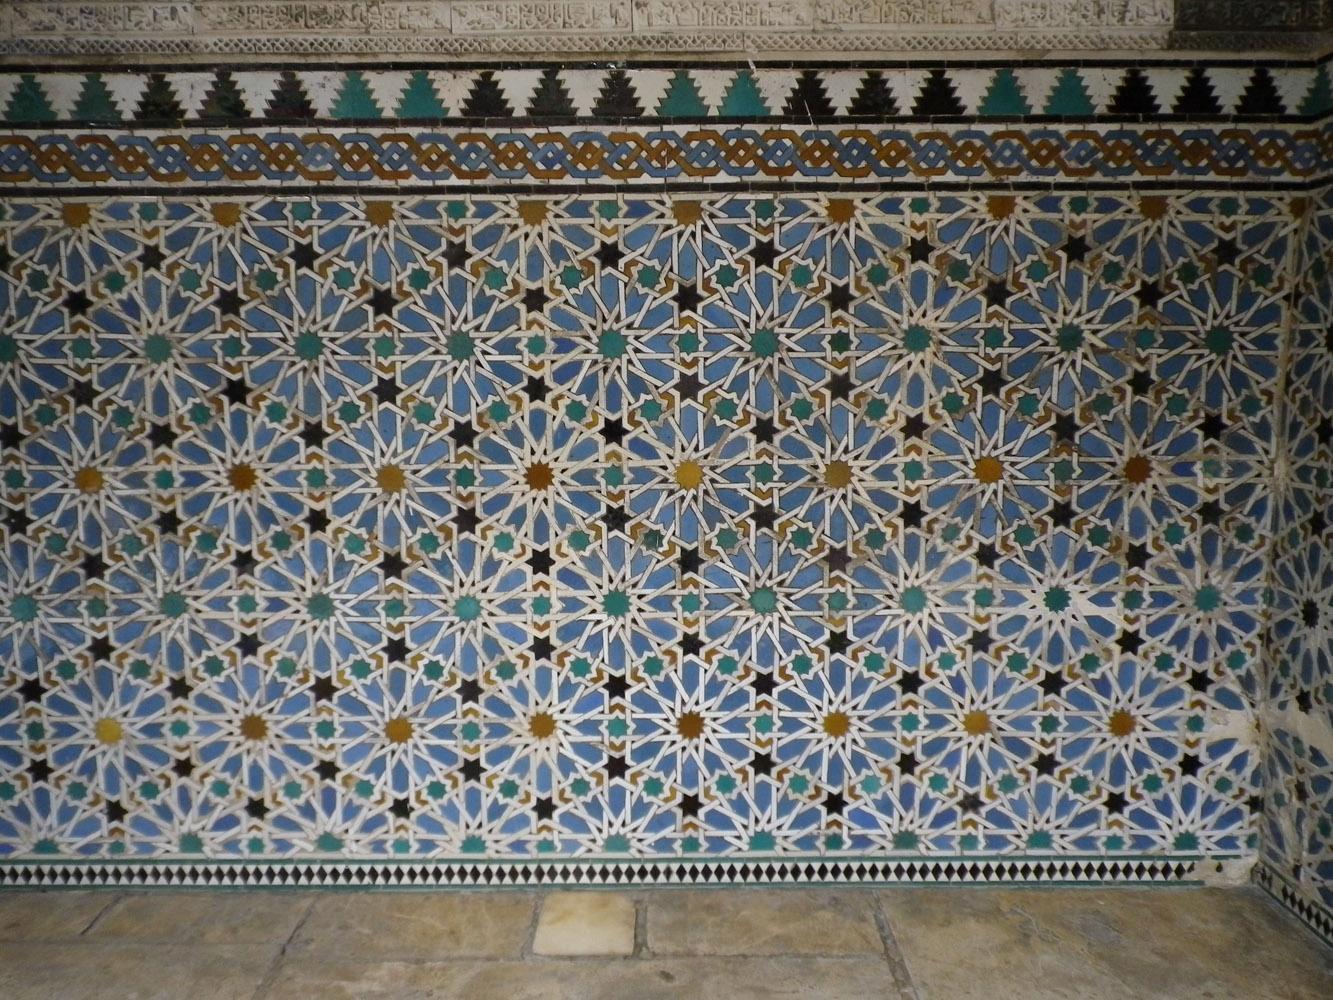 Tessellation row jane richlovsky tessellation row dailygadgetfo Images